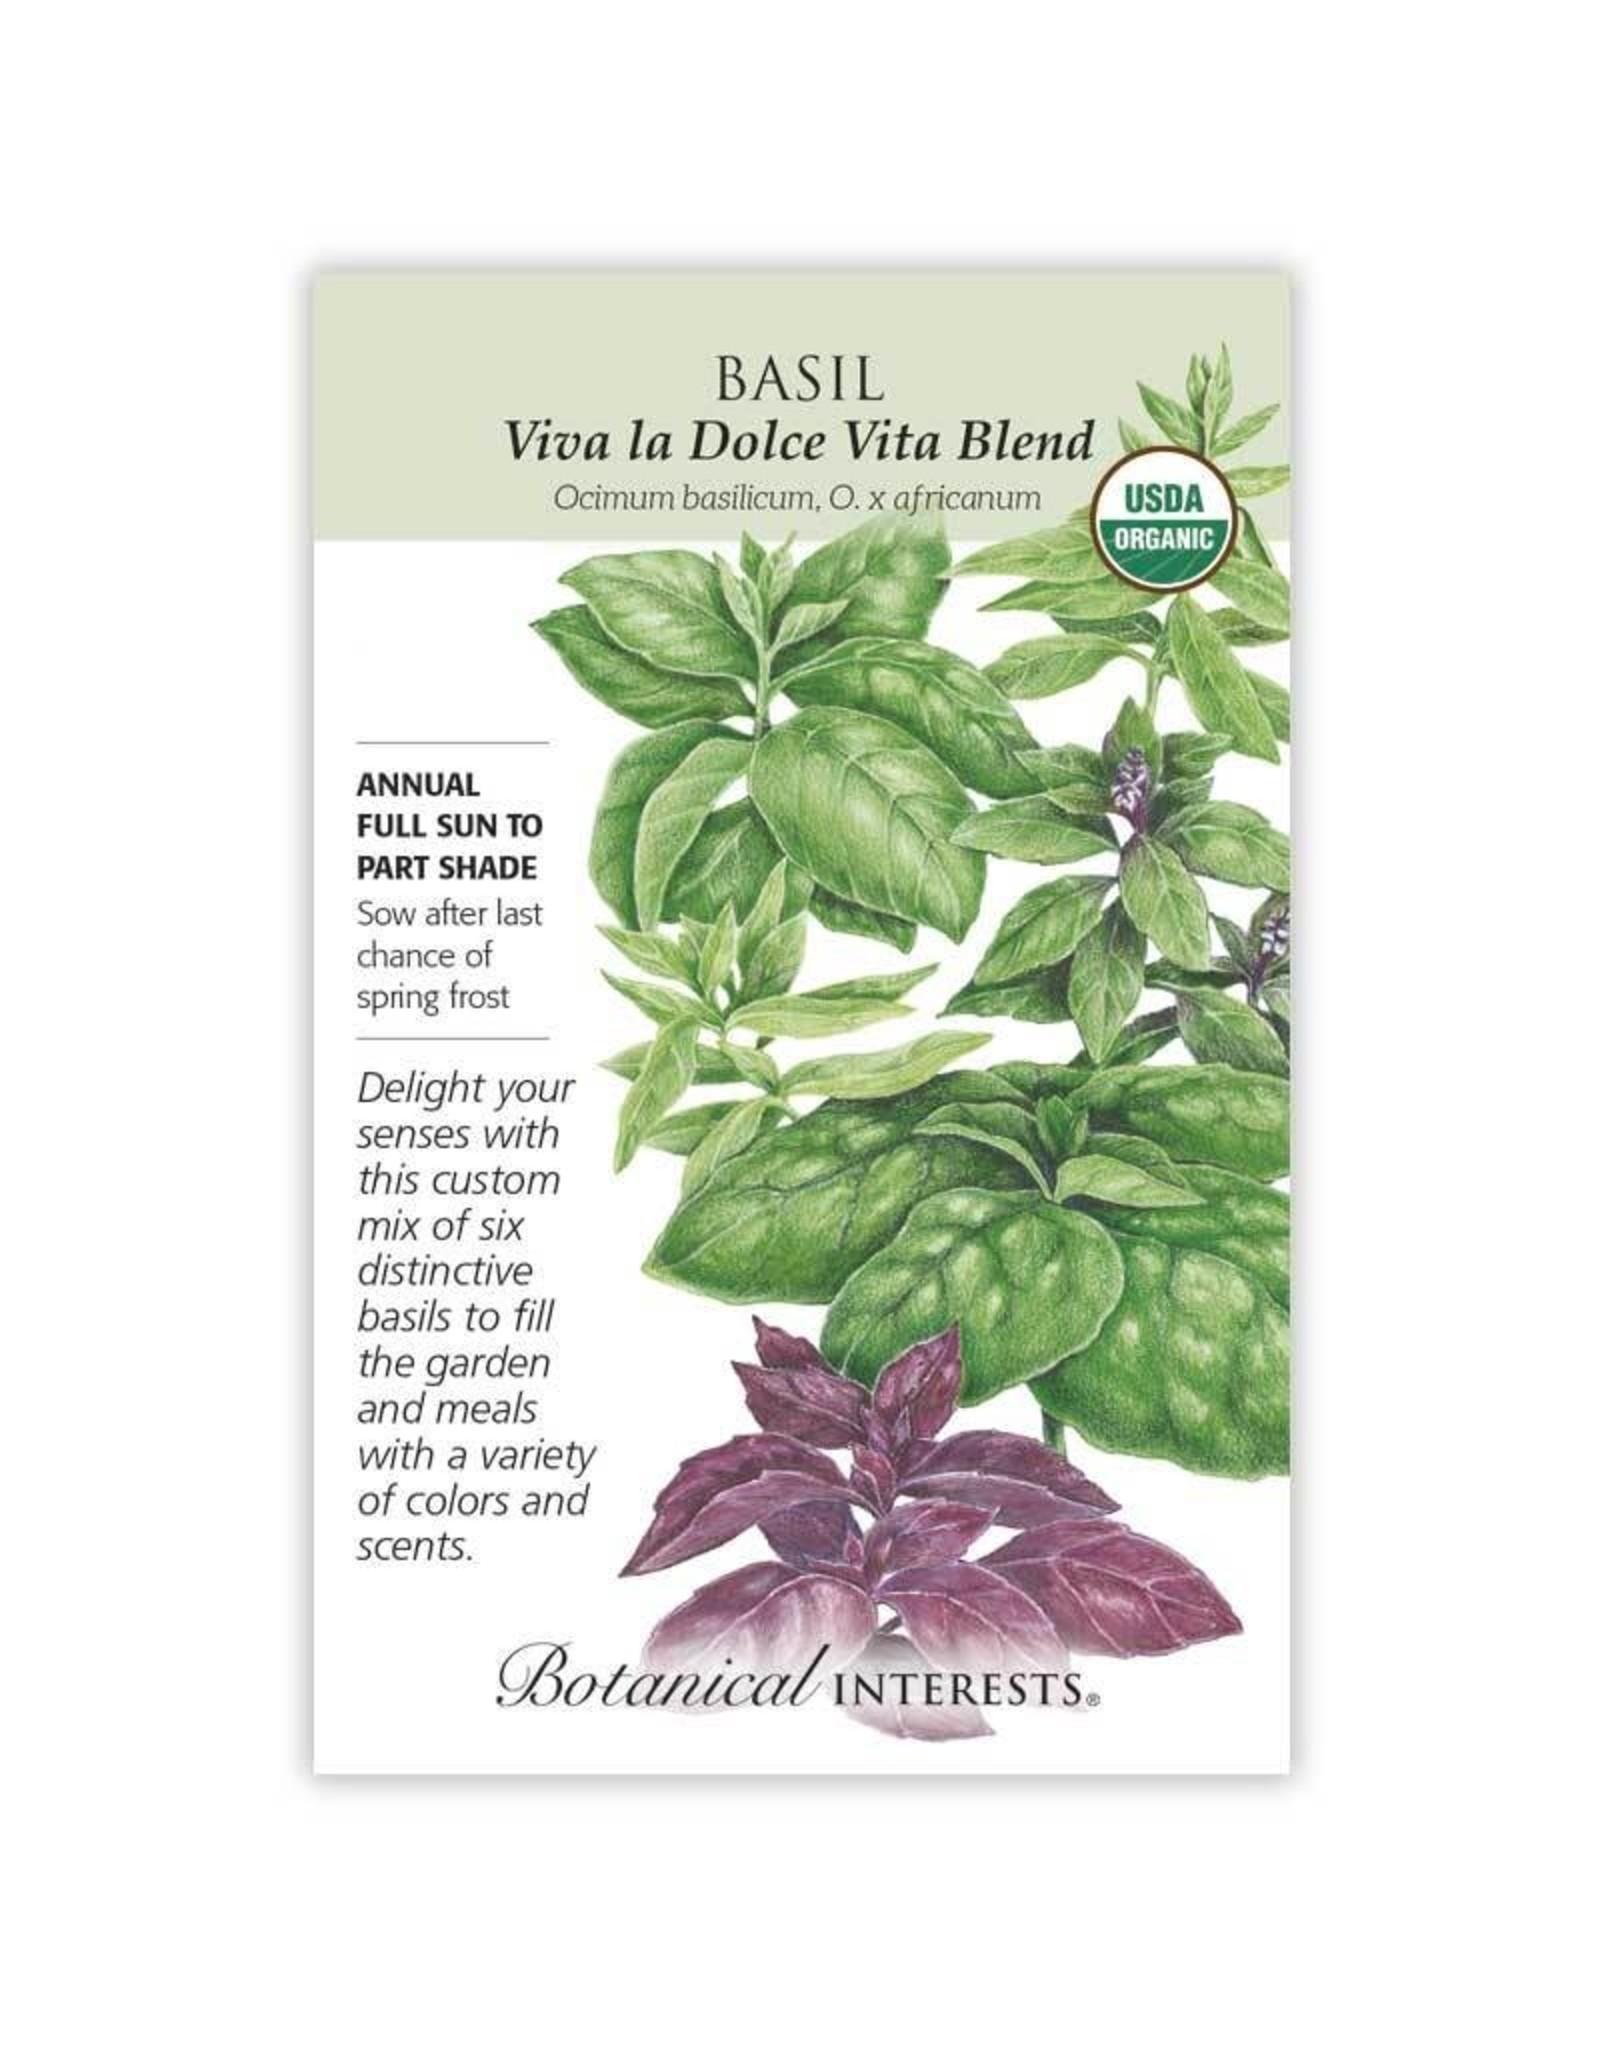 Seeds - Basil Viva la Dolce Vita Blend Organic